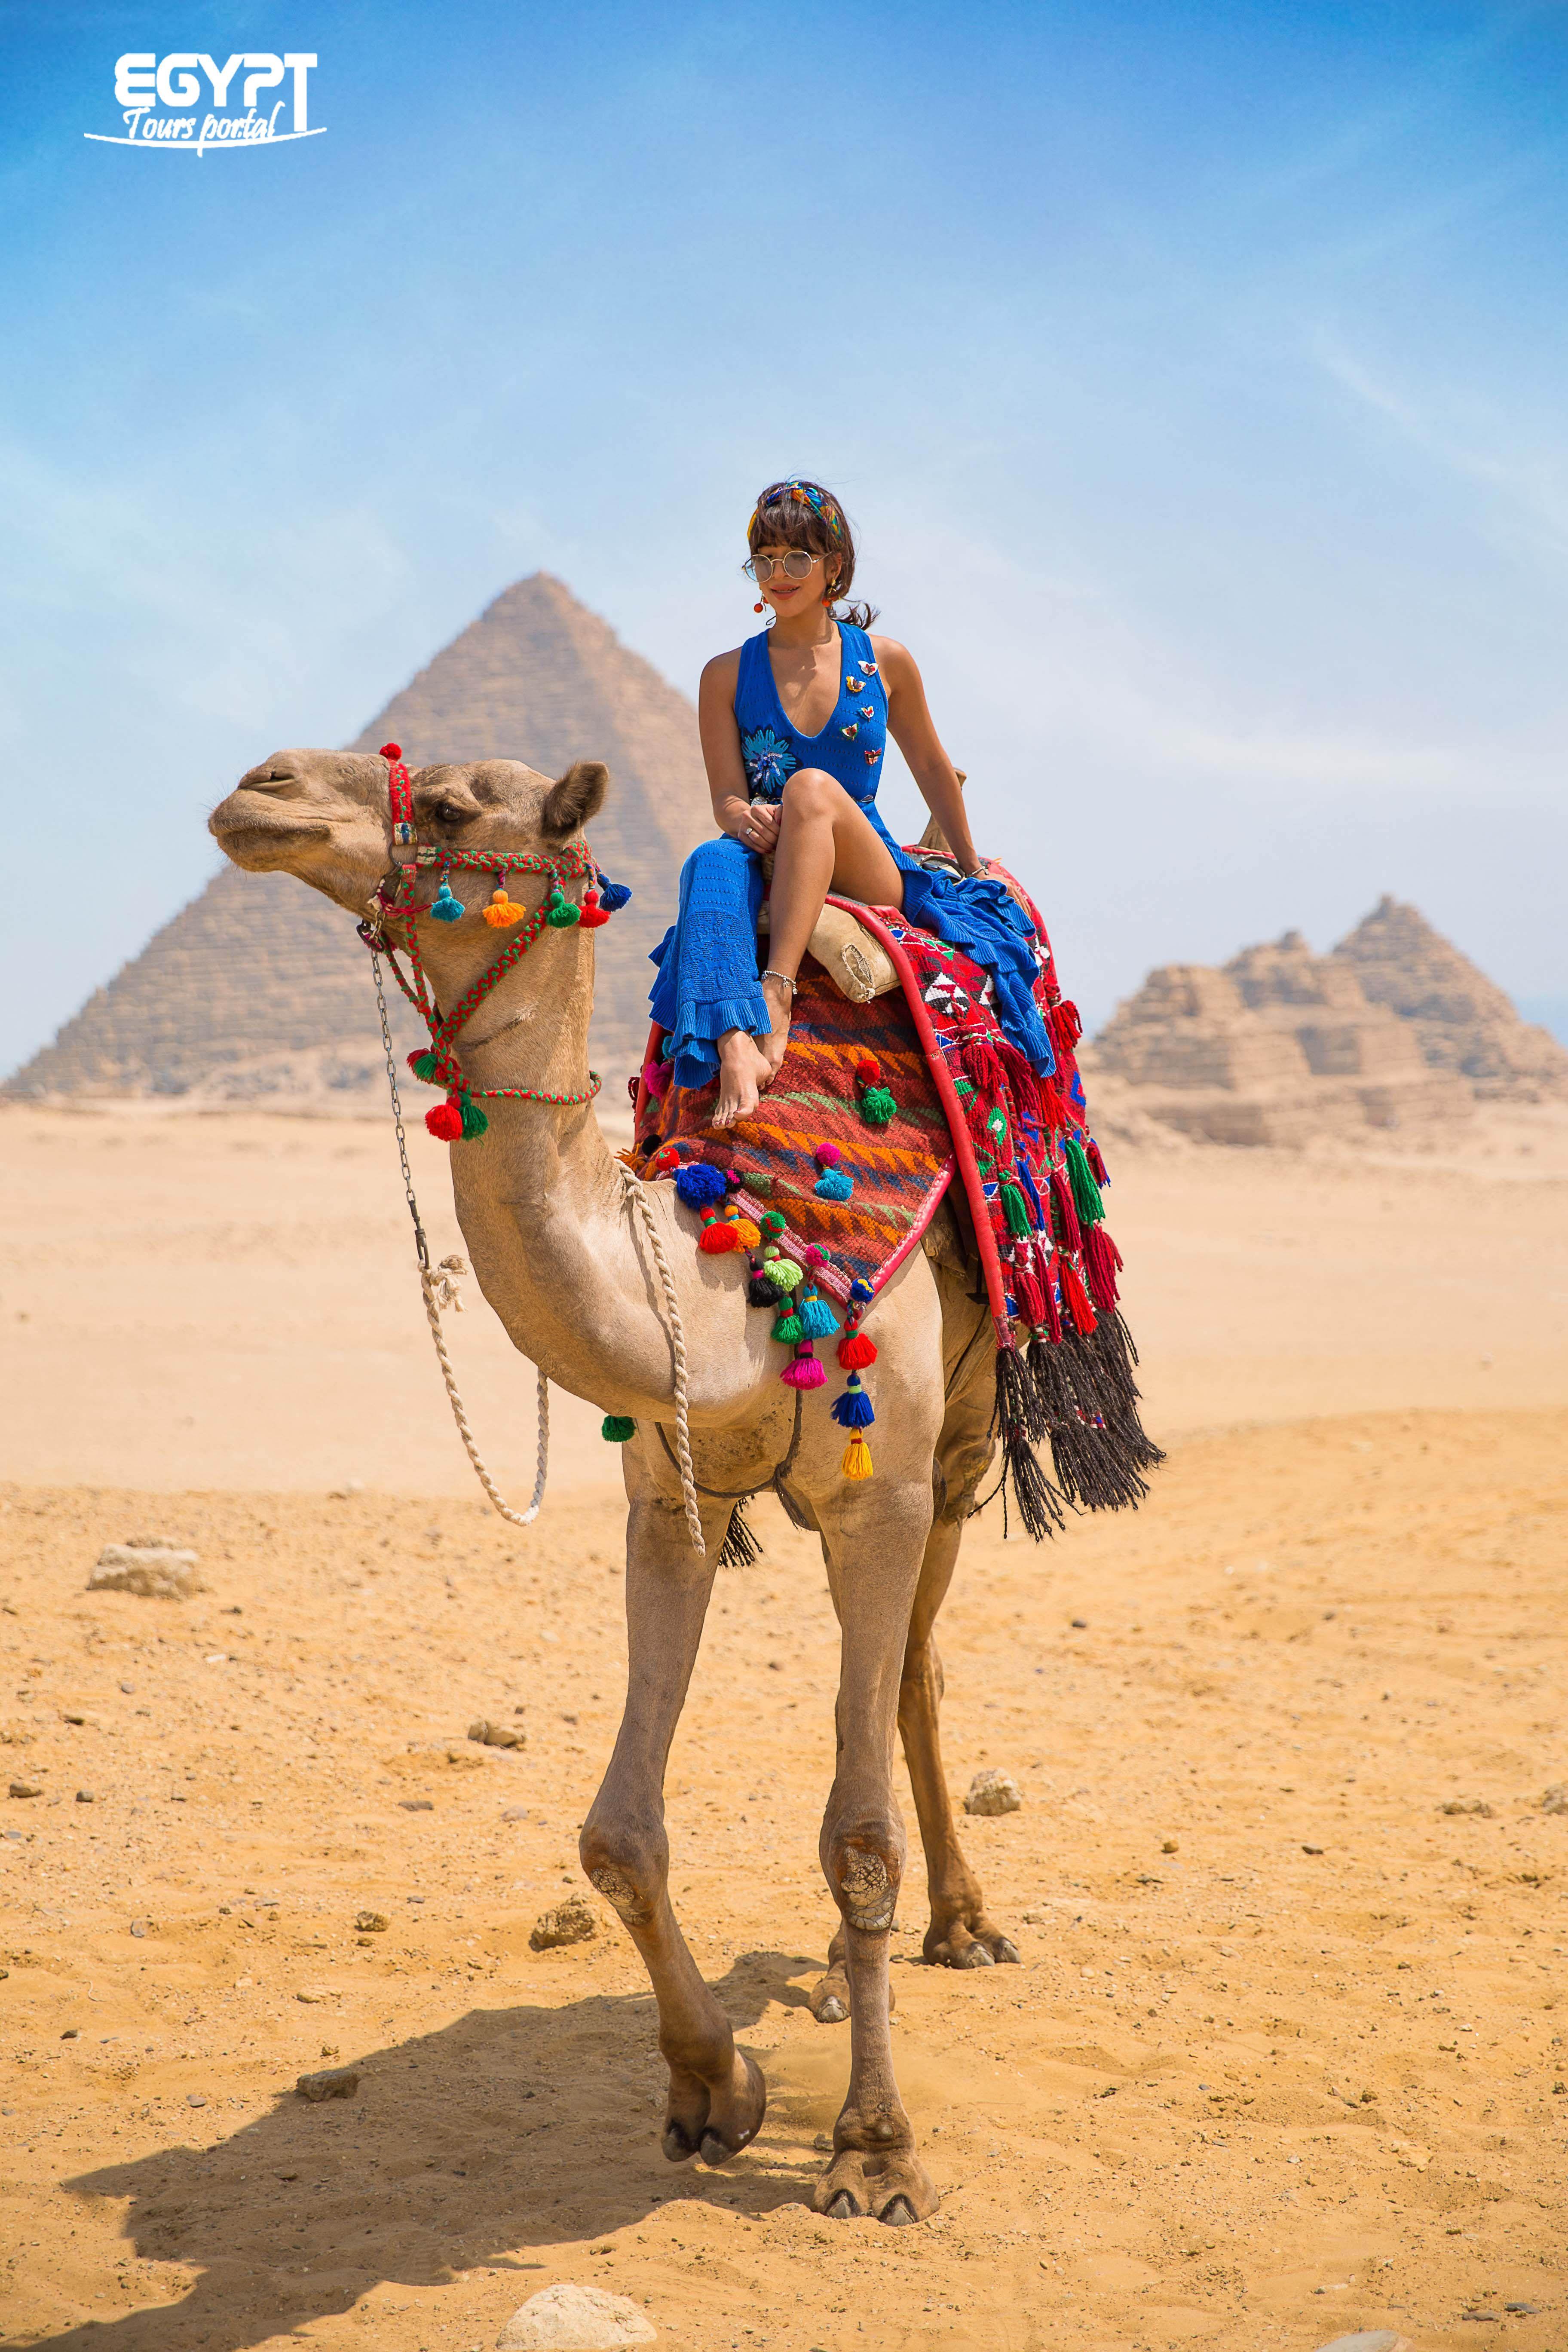 Egypt Christmas Holidays in 2020 Egypt, Egypt travel